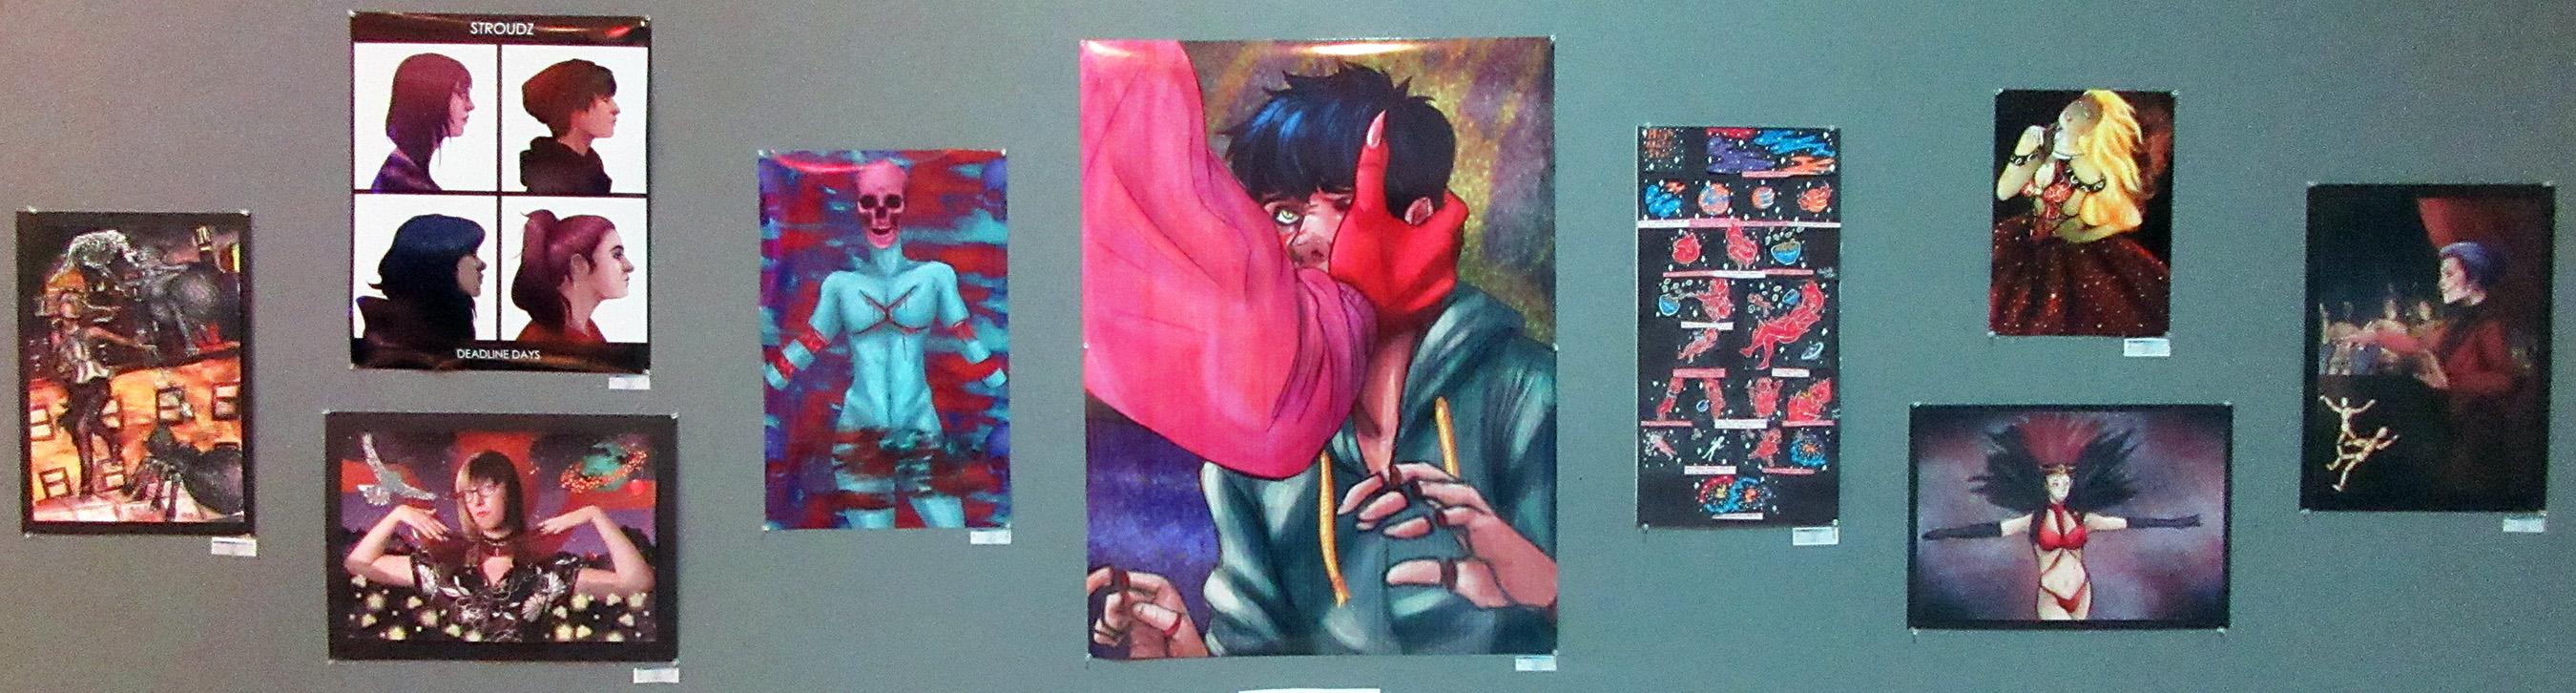 Gallery22